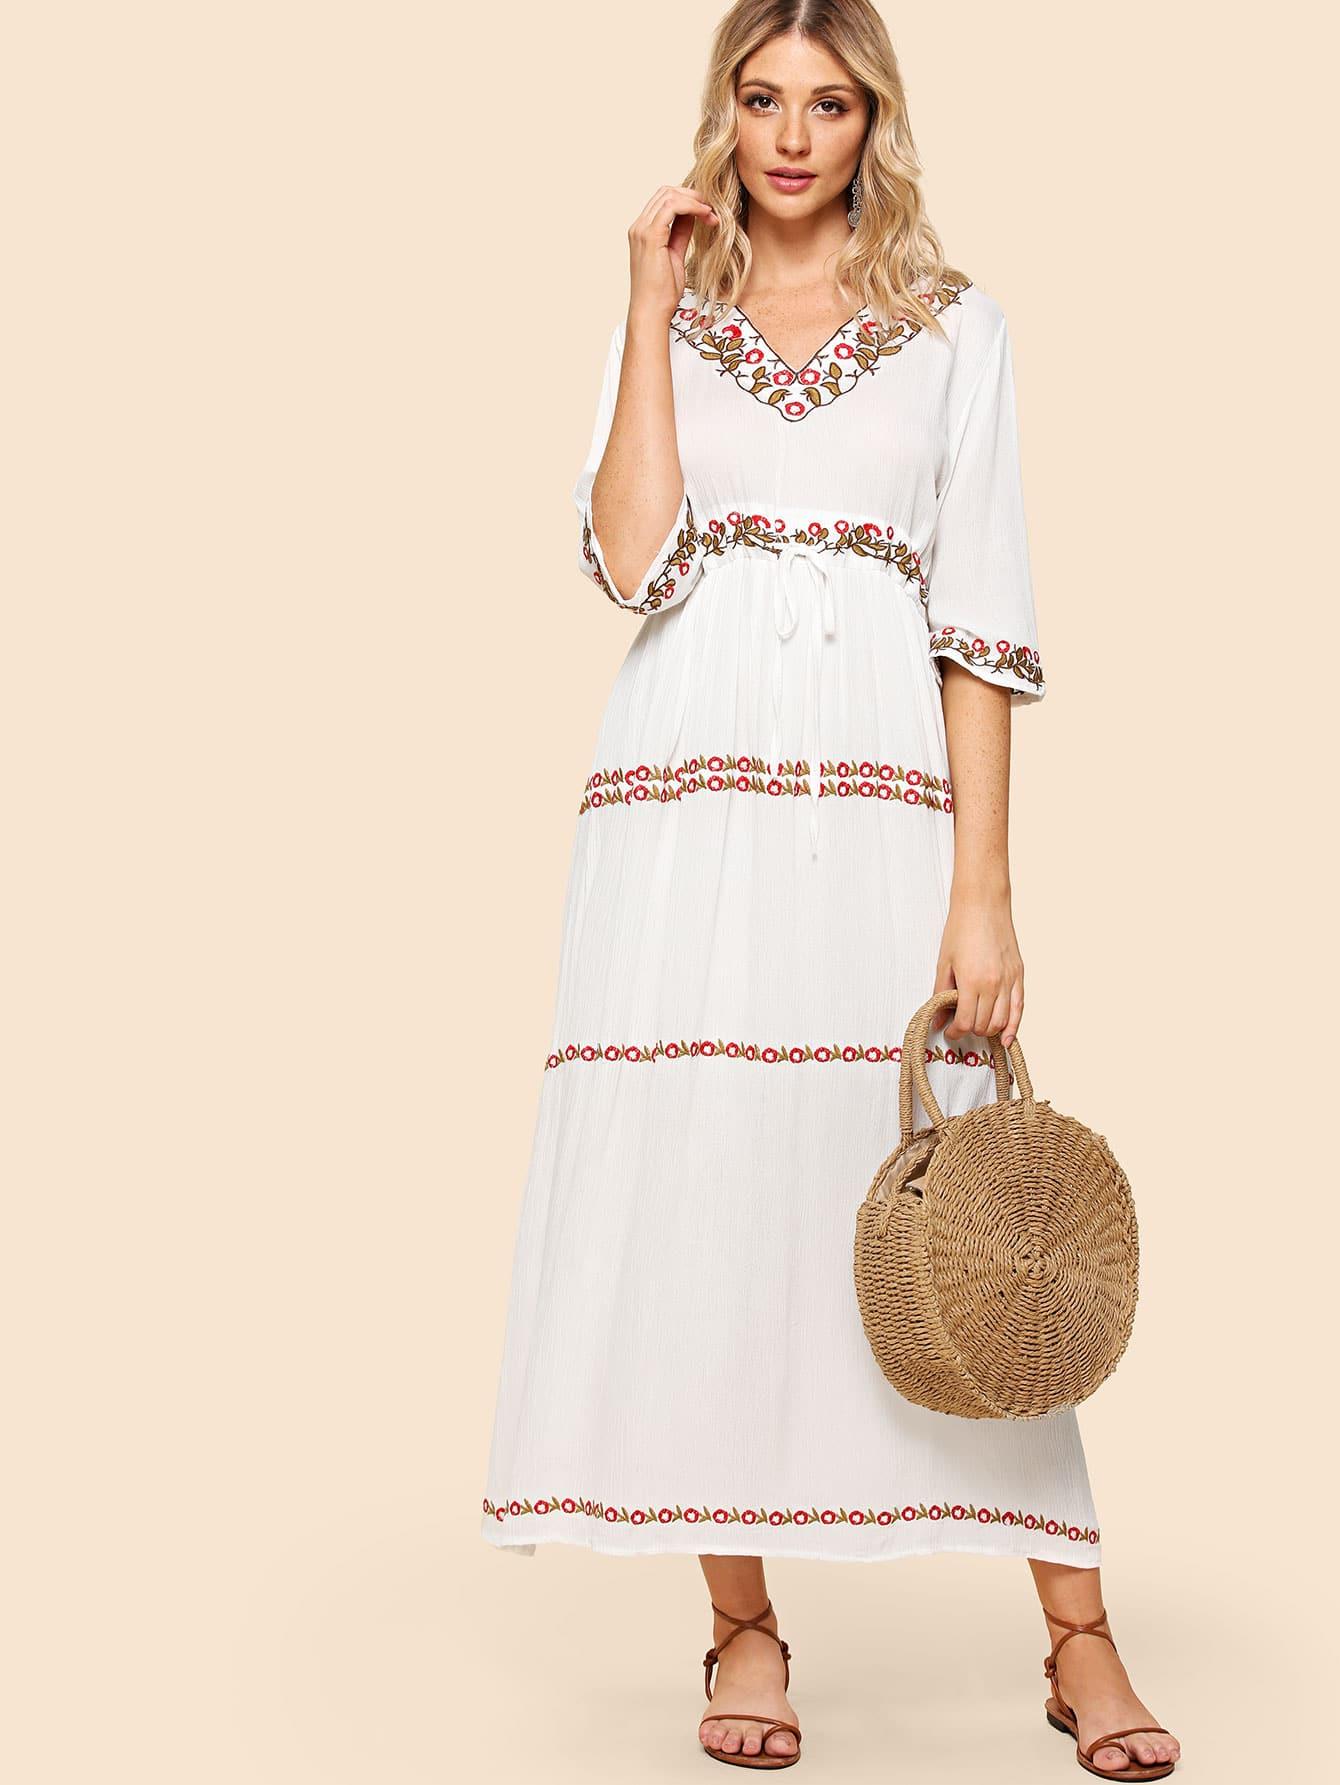 Drawstring Waist Embroidered Dress drawstring waist tank dress